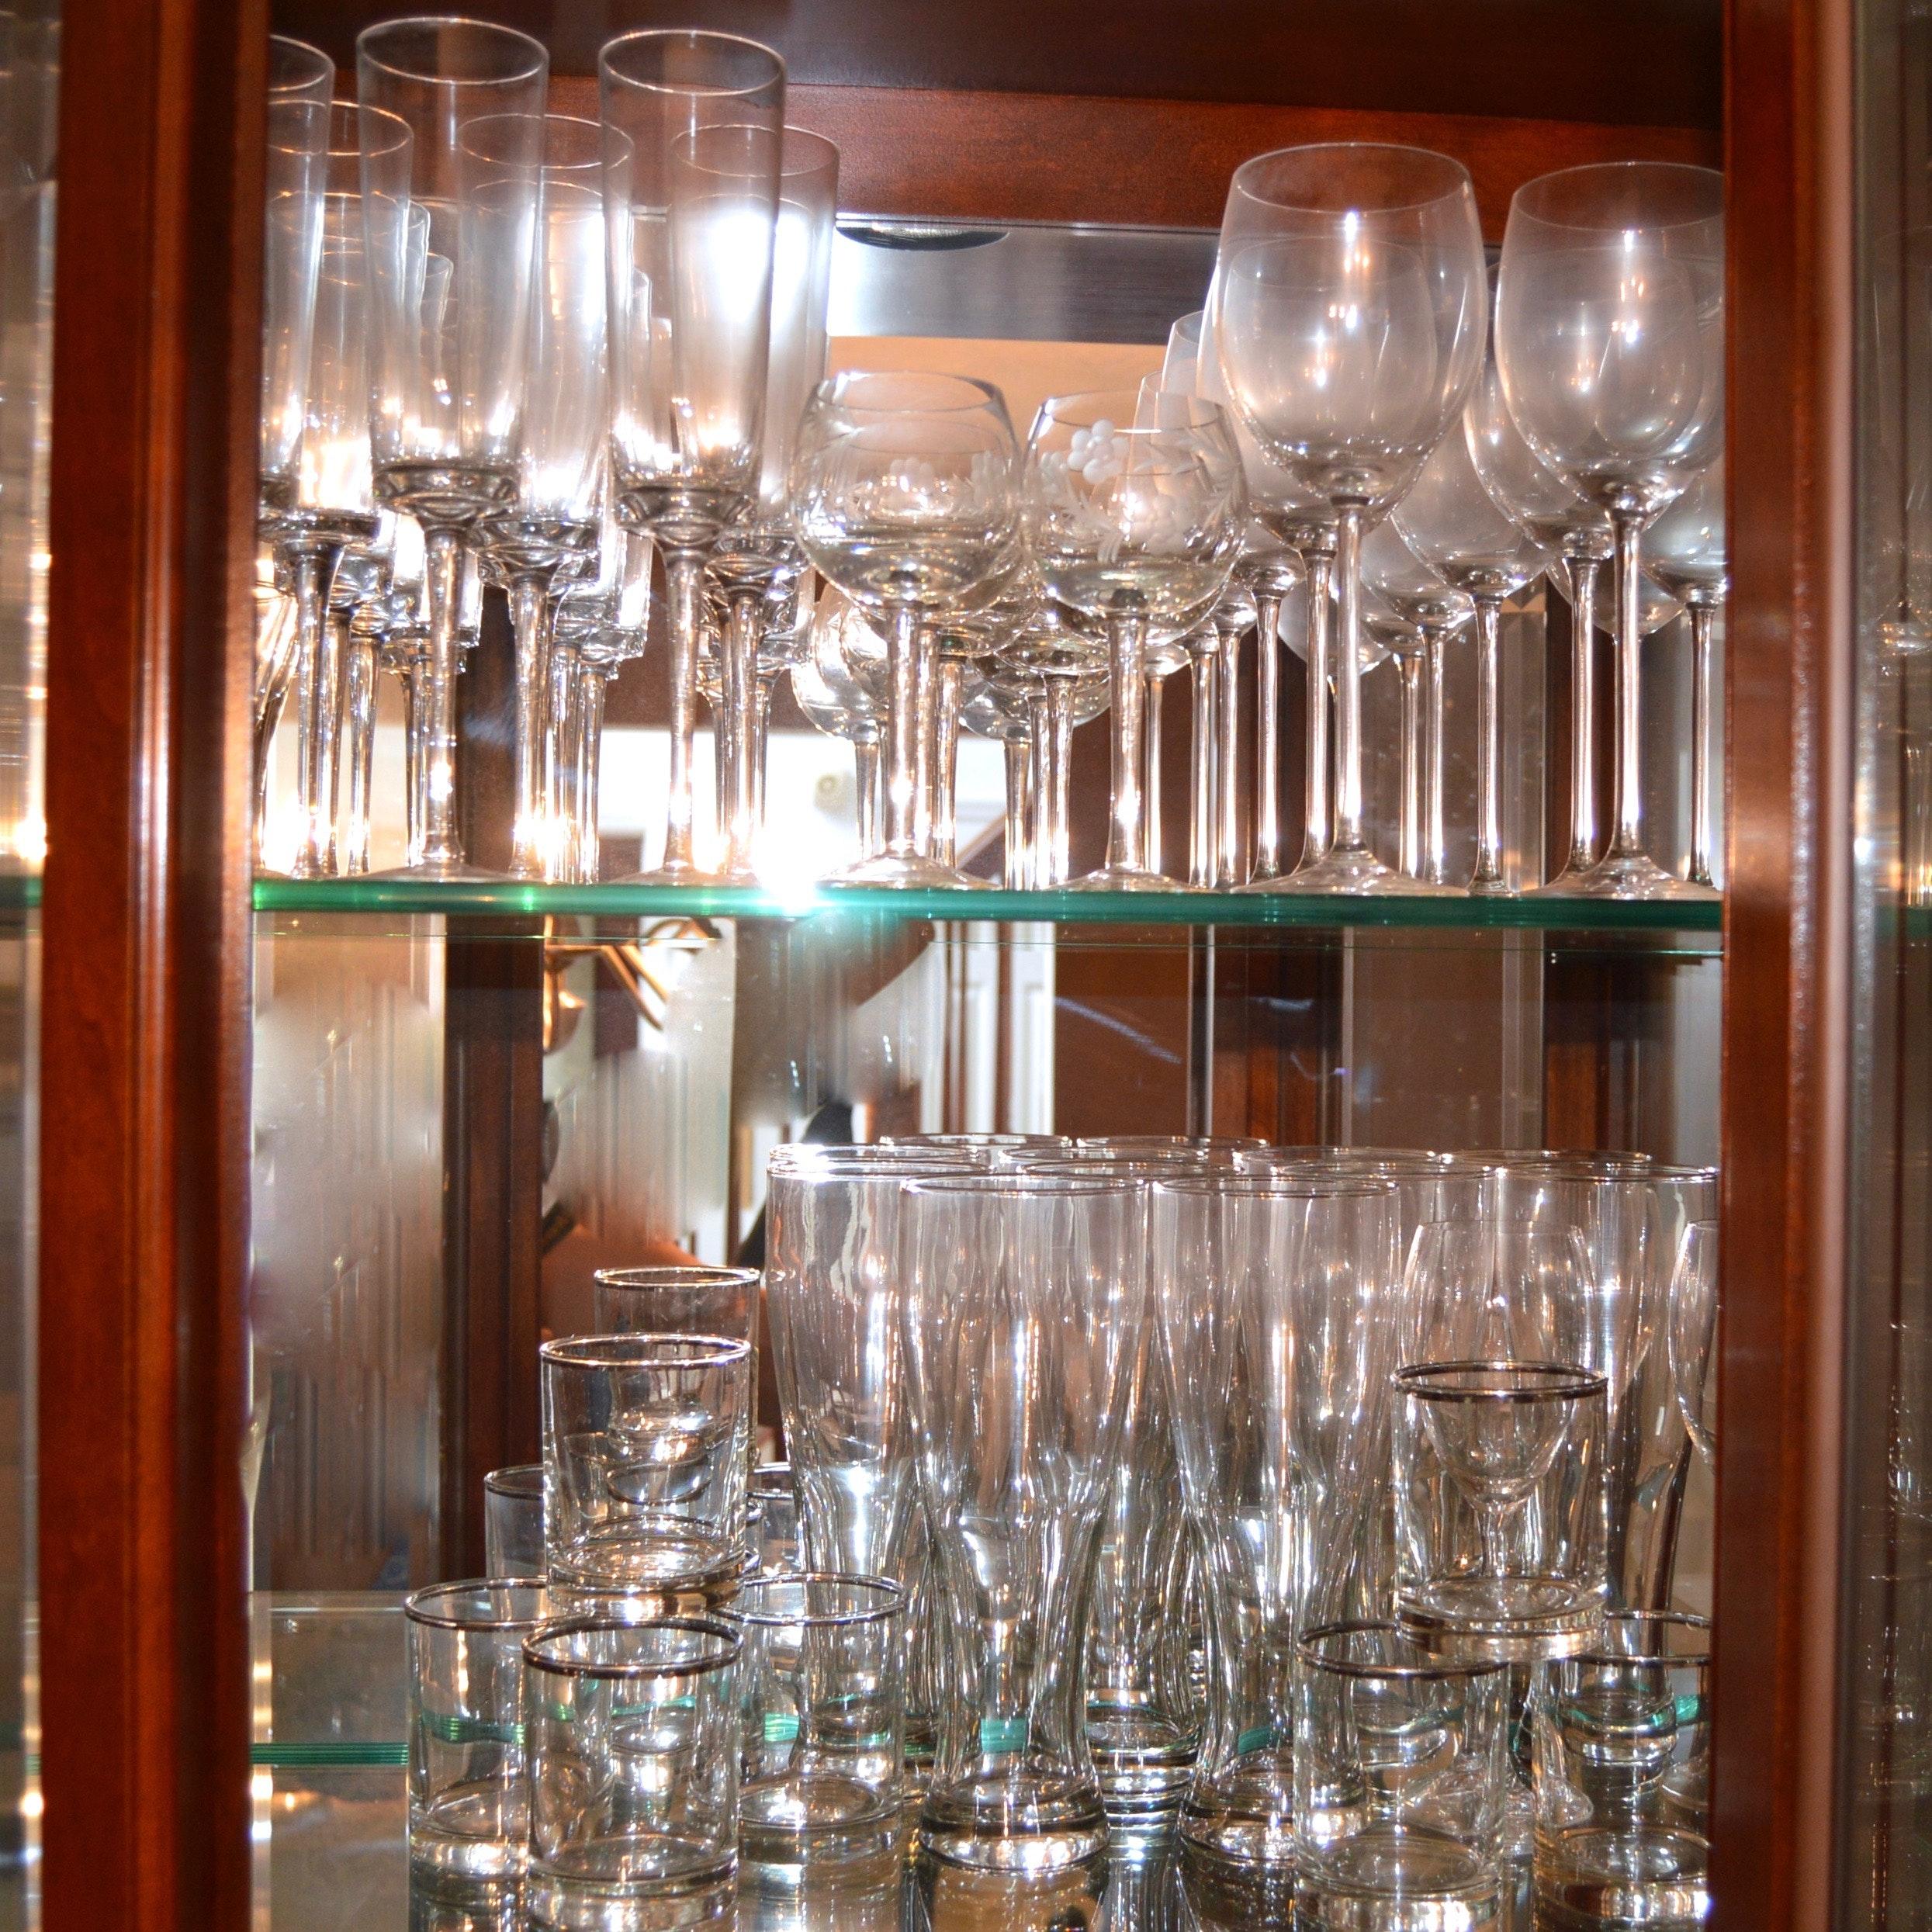 Stemware and Barware Glasses